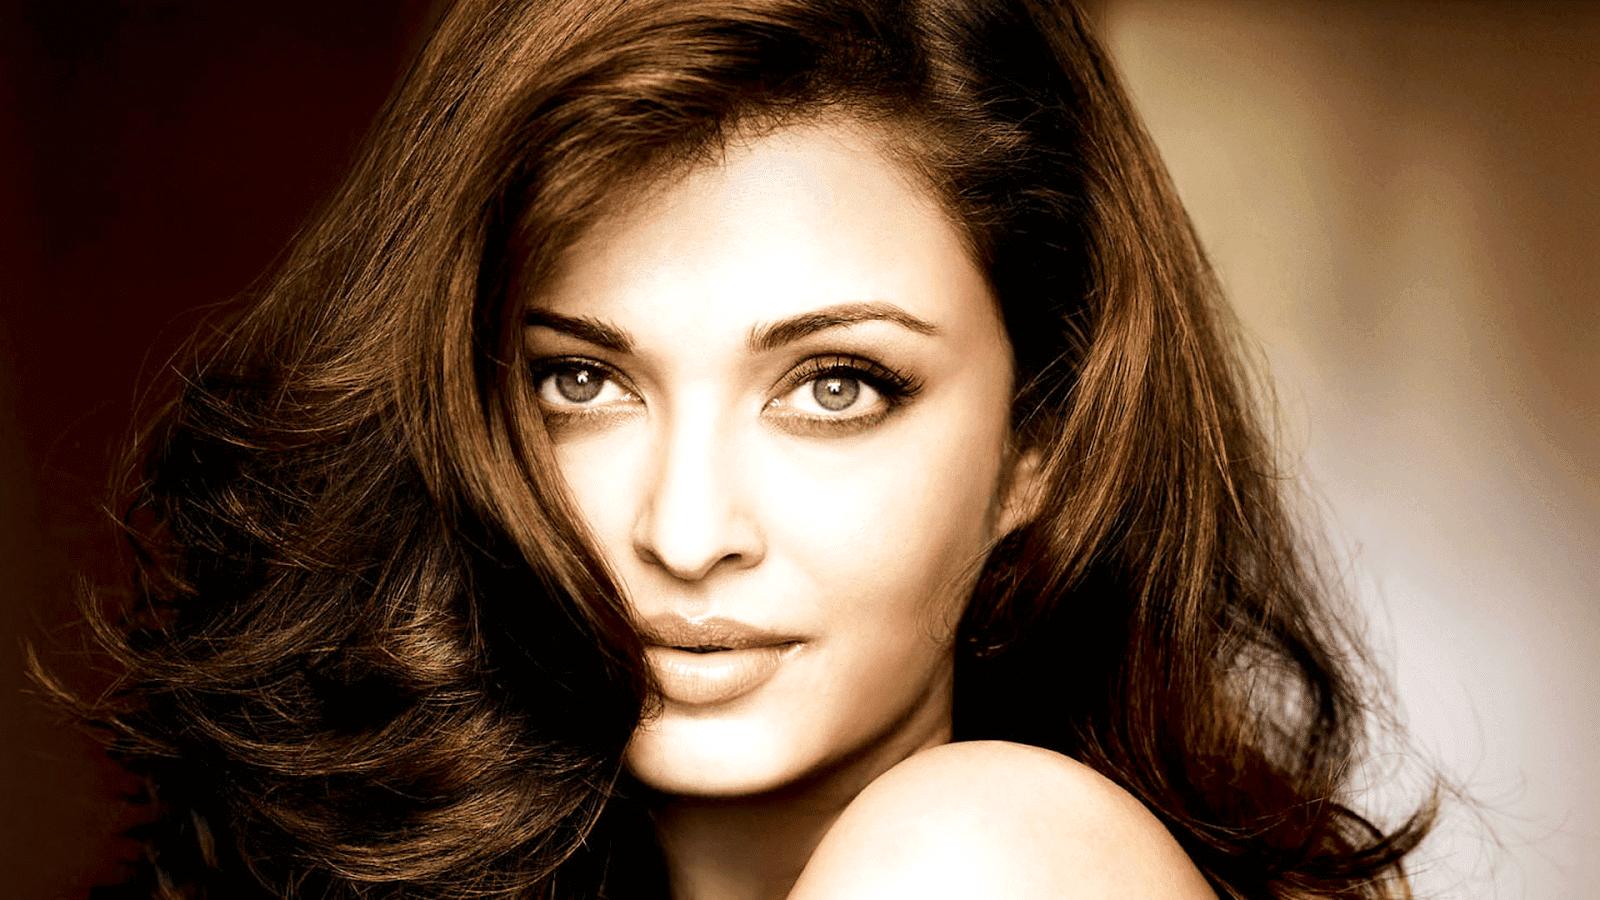 Cute Hollywood Actress Hd Wallpapers Aishwarya Rai Bachchan Wallpapers Hd Download Free 1080p